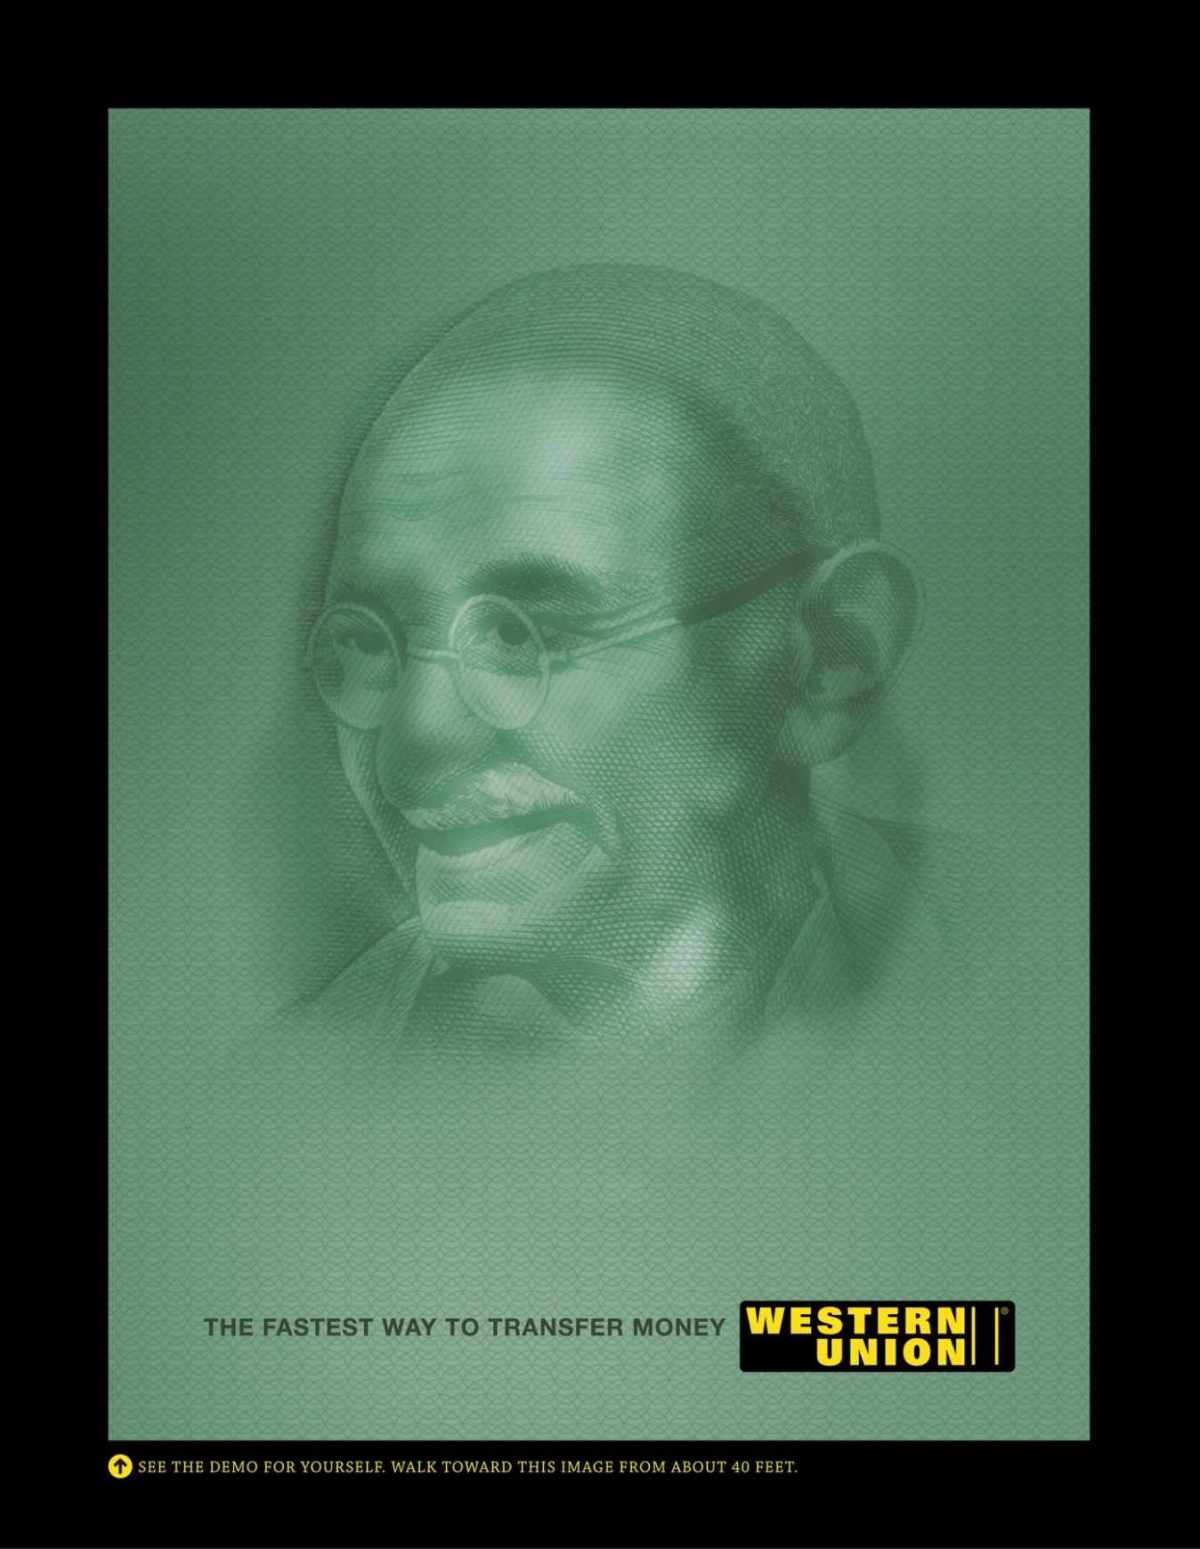 western_union_money_transfer_-_western_union_demo_posters_-_1_of_3_-_franklyn_gandhi_-_mccann_worldgroup_india_-_mumbai_aotw